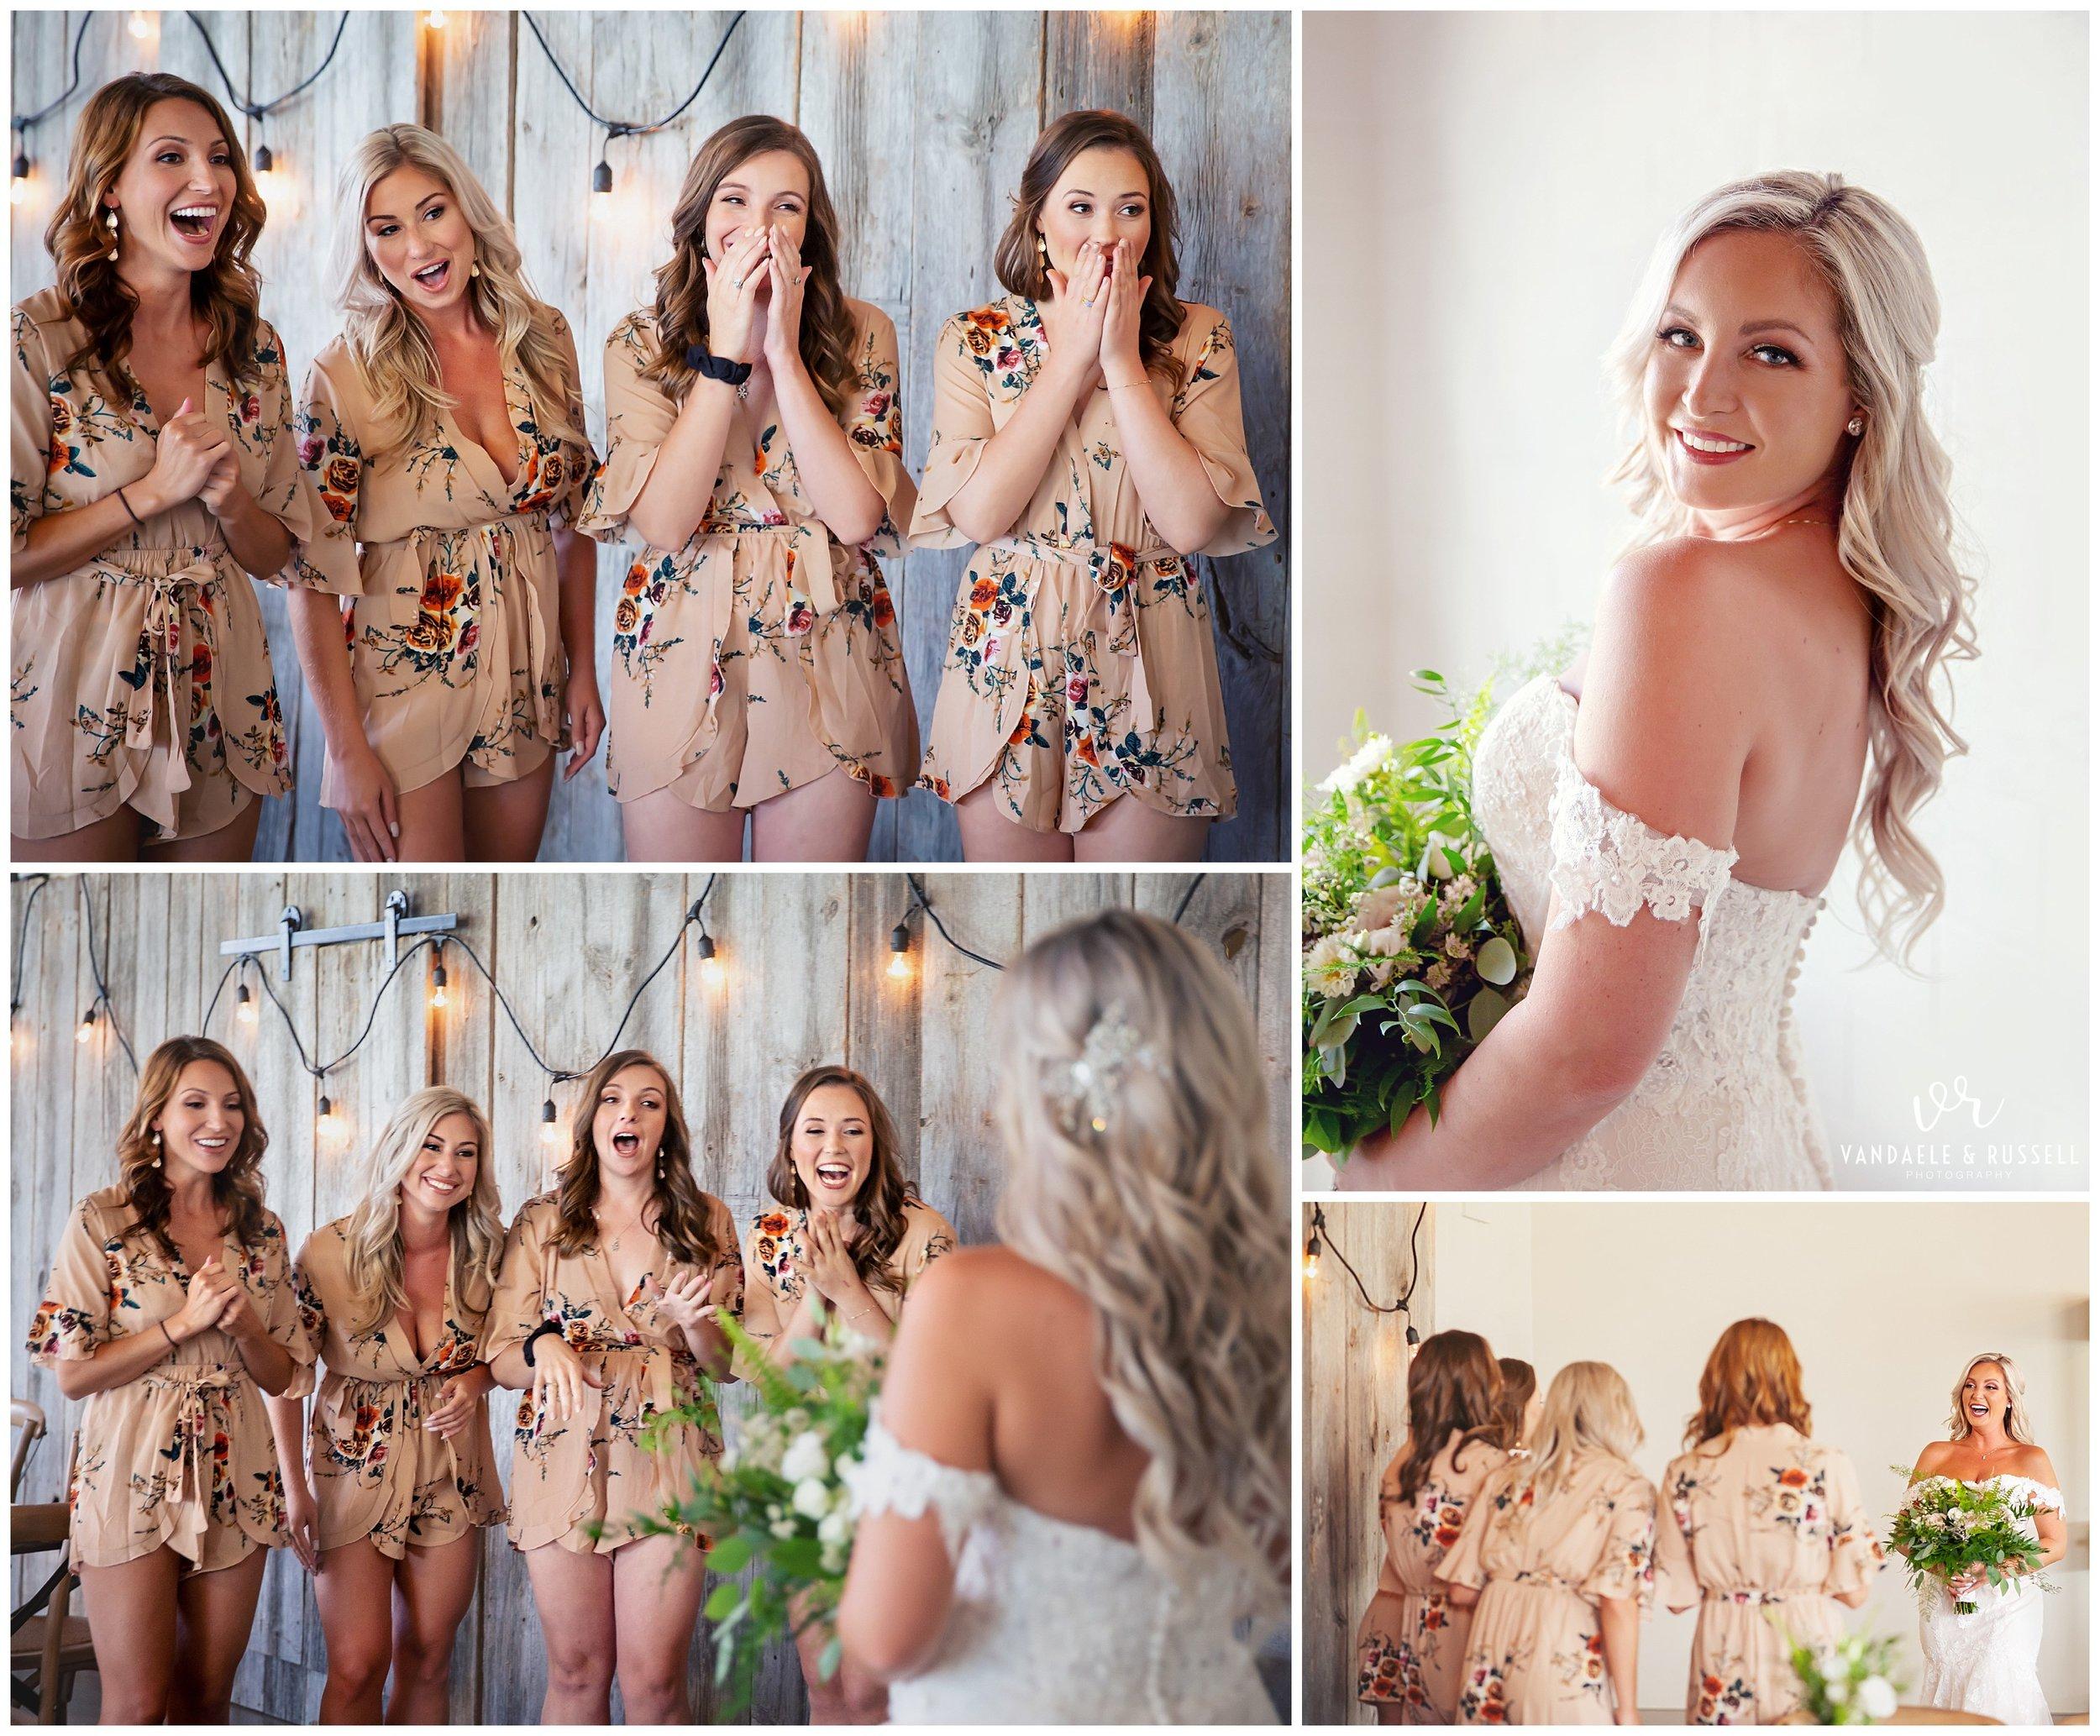 VanDaele-Russell-Wedding-Photography-London-Toronto-Ontario_0149.jpg